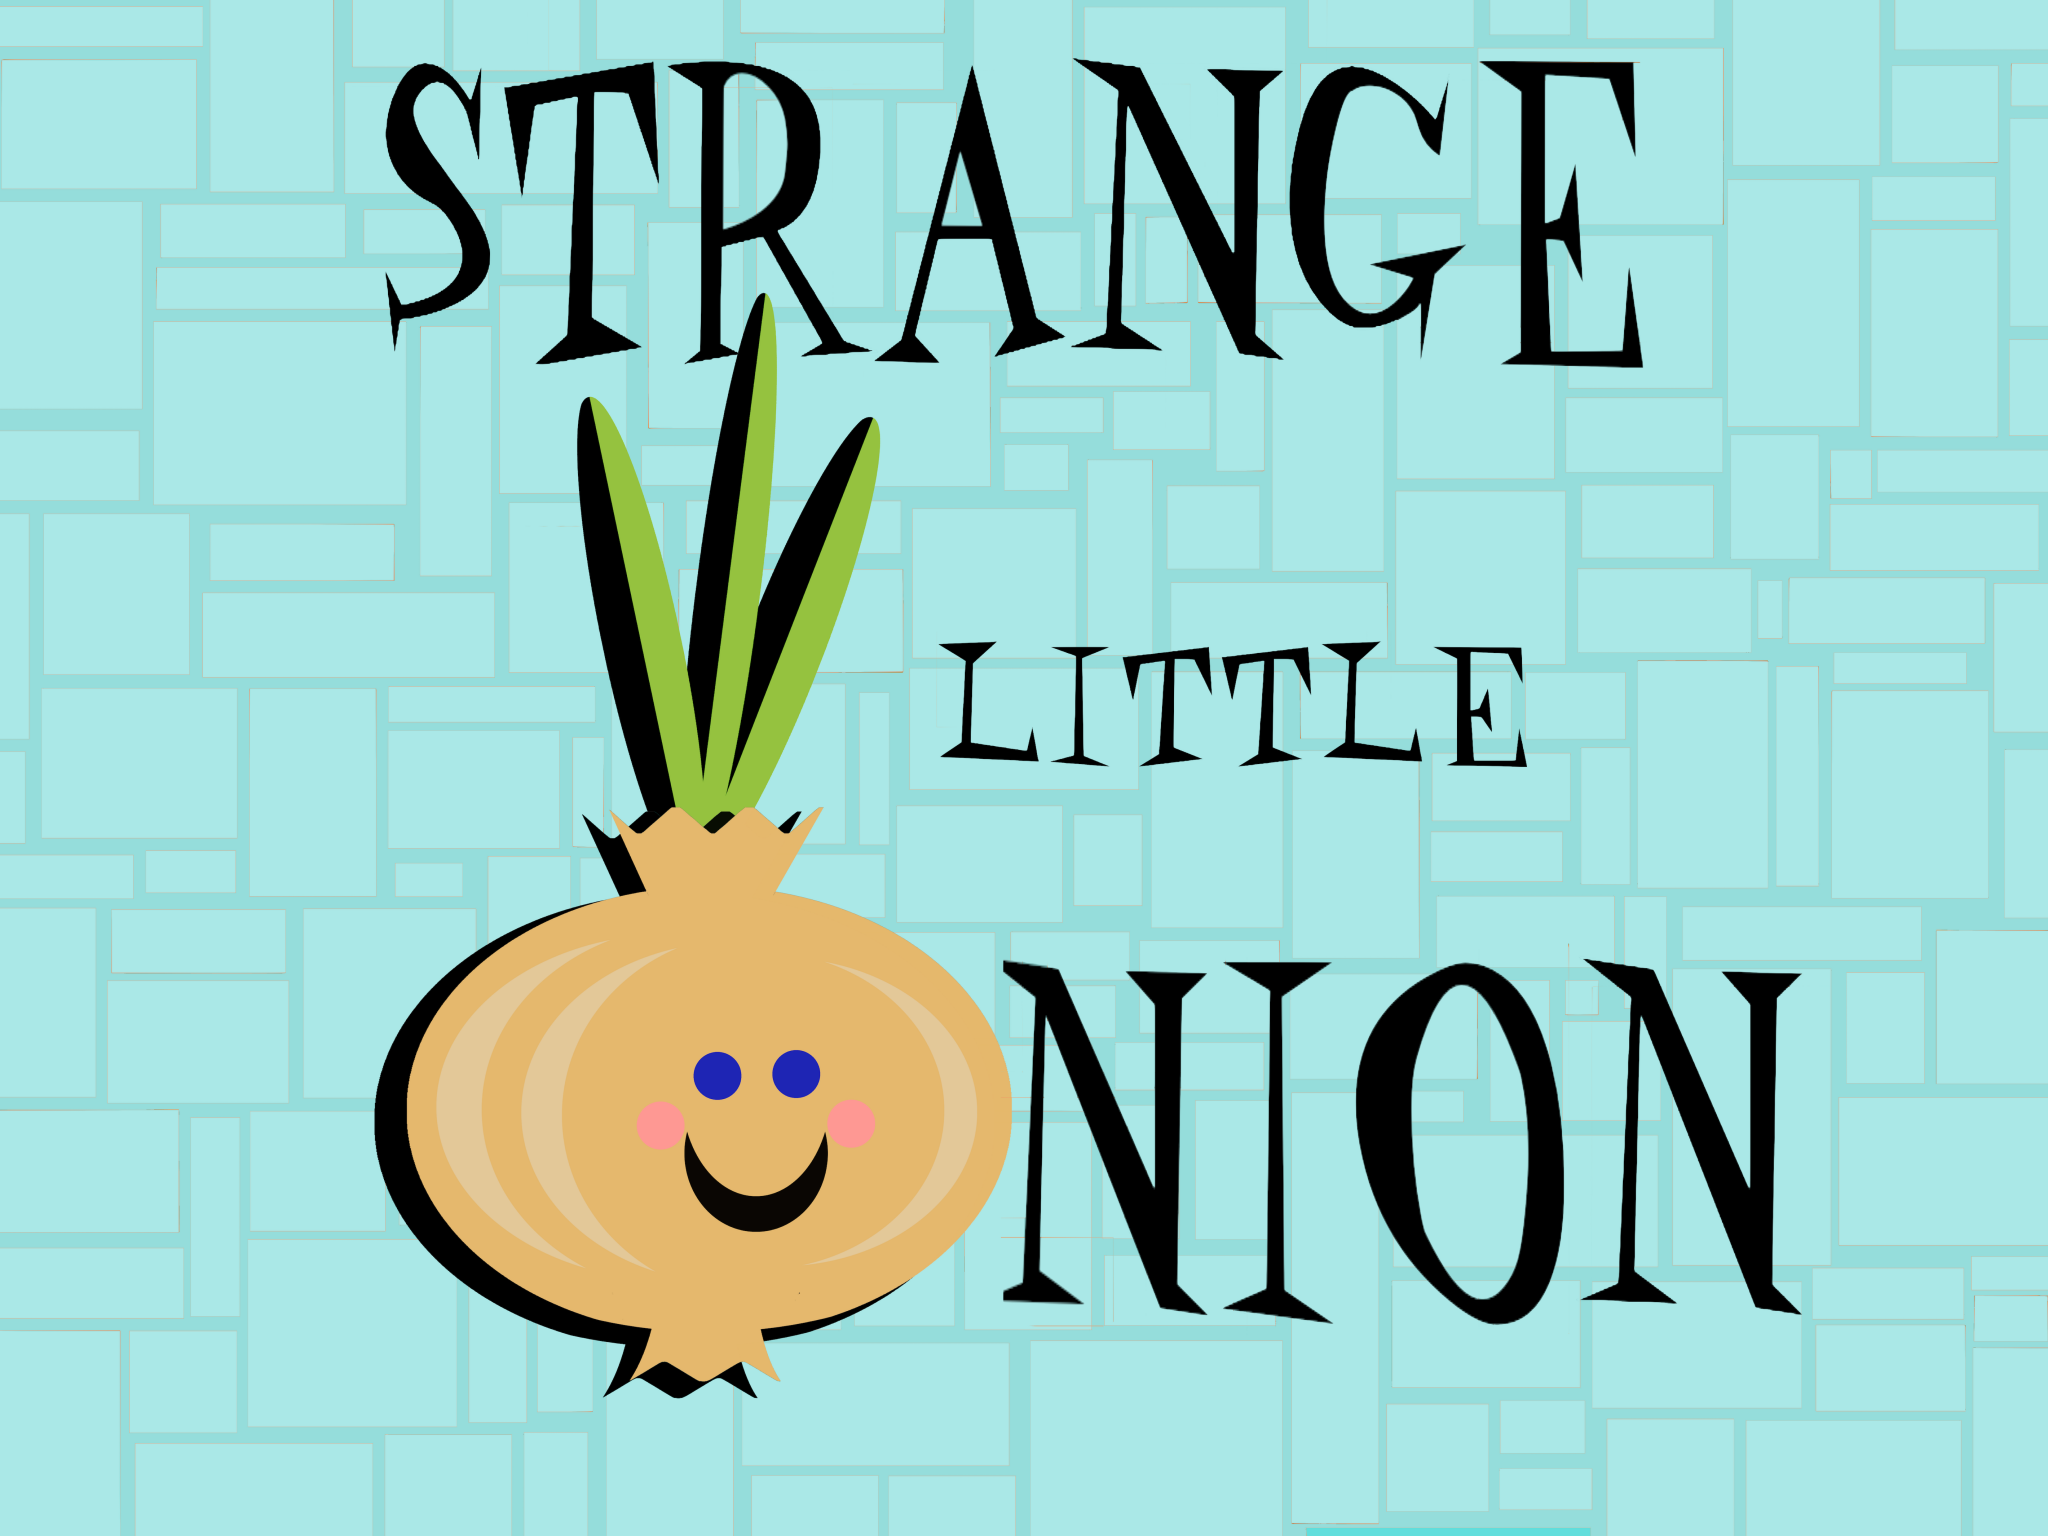 Strange Little Onion - My Imaginary Talk Show